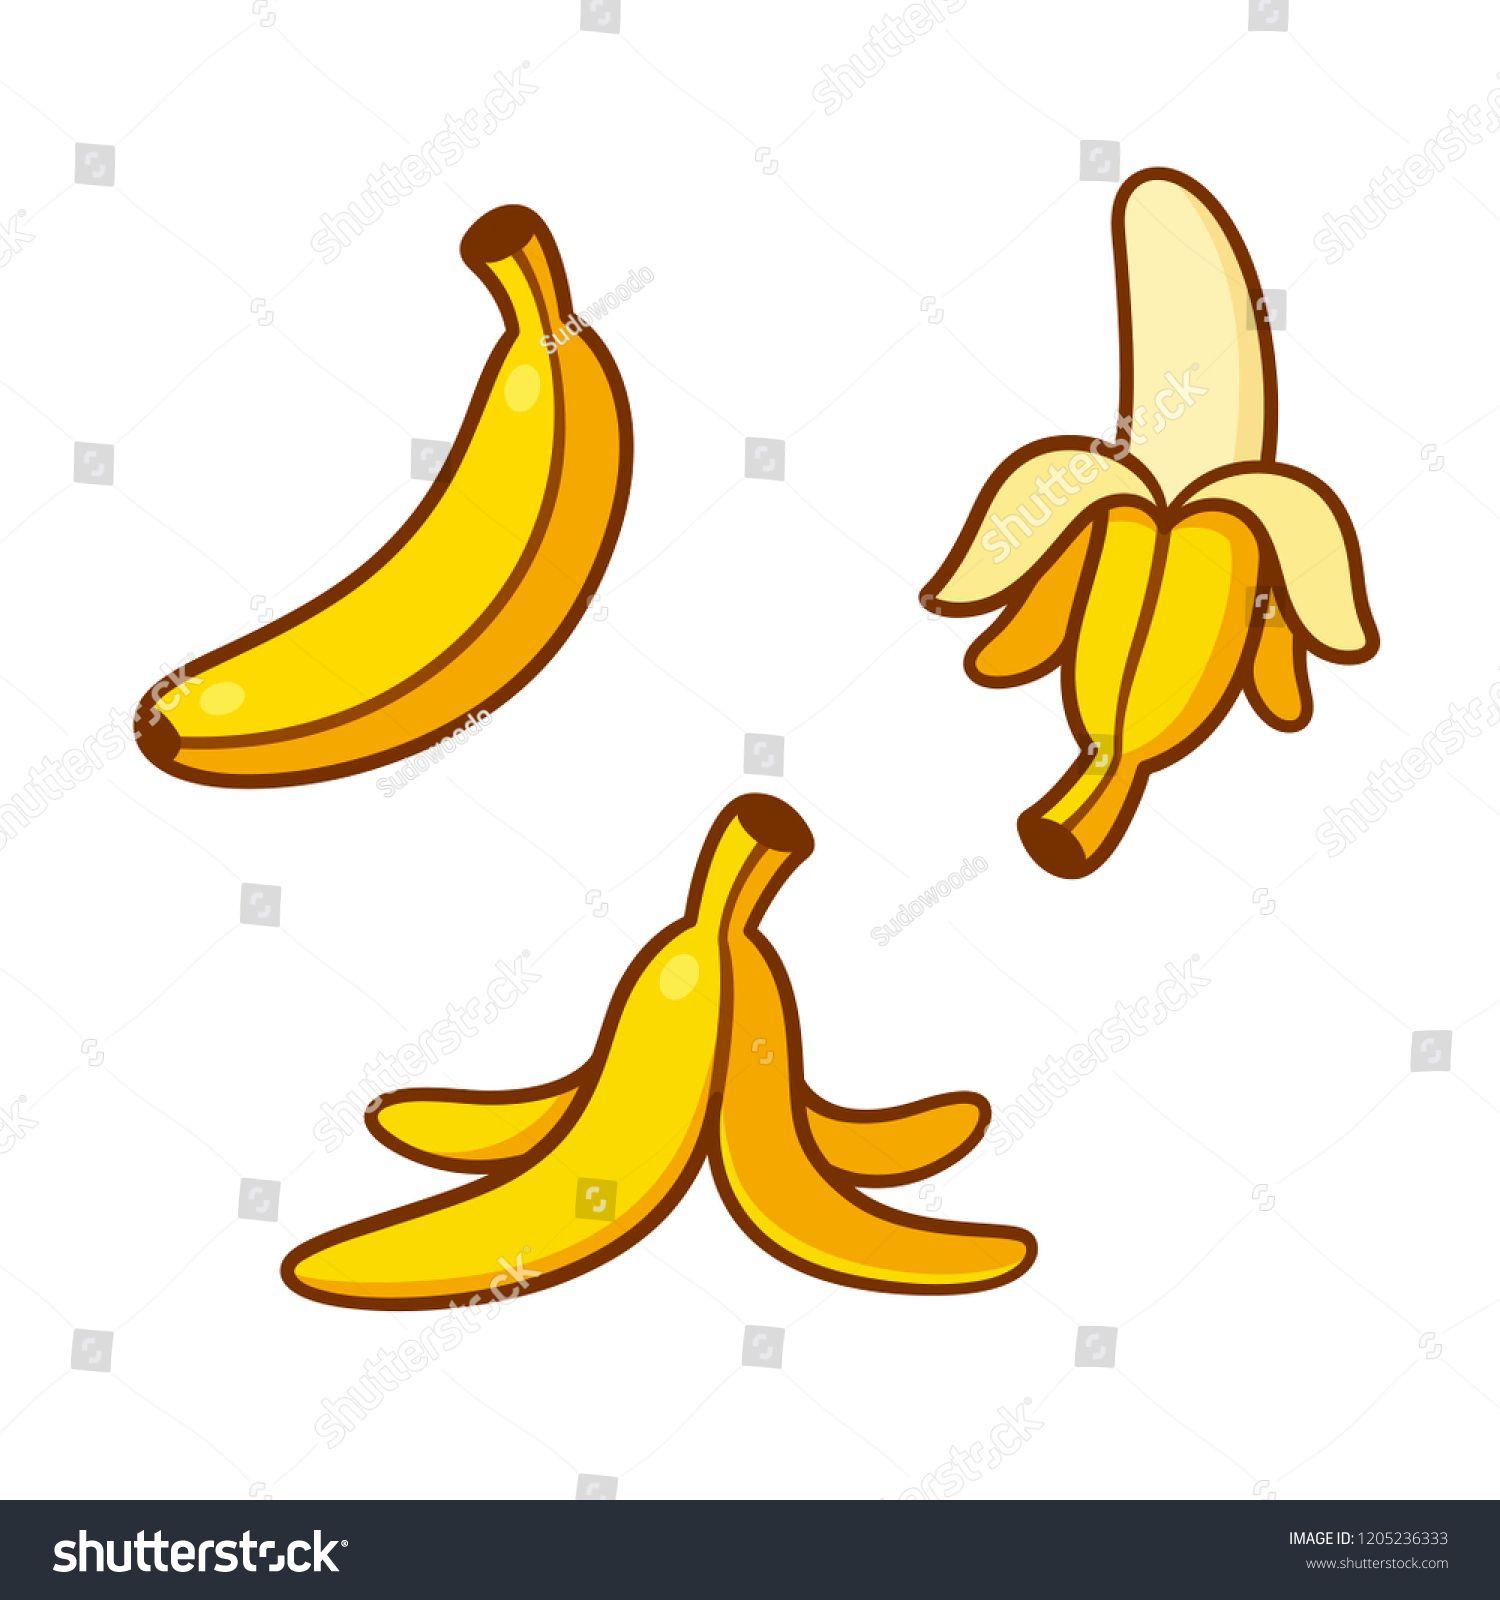 Set Of Cartoon Banana Drawings Single Peeled And Banana Peel On The Ground Vector Clip Art Illustration Collection Cartoon Banana Fruits Drawing Banana Art